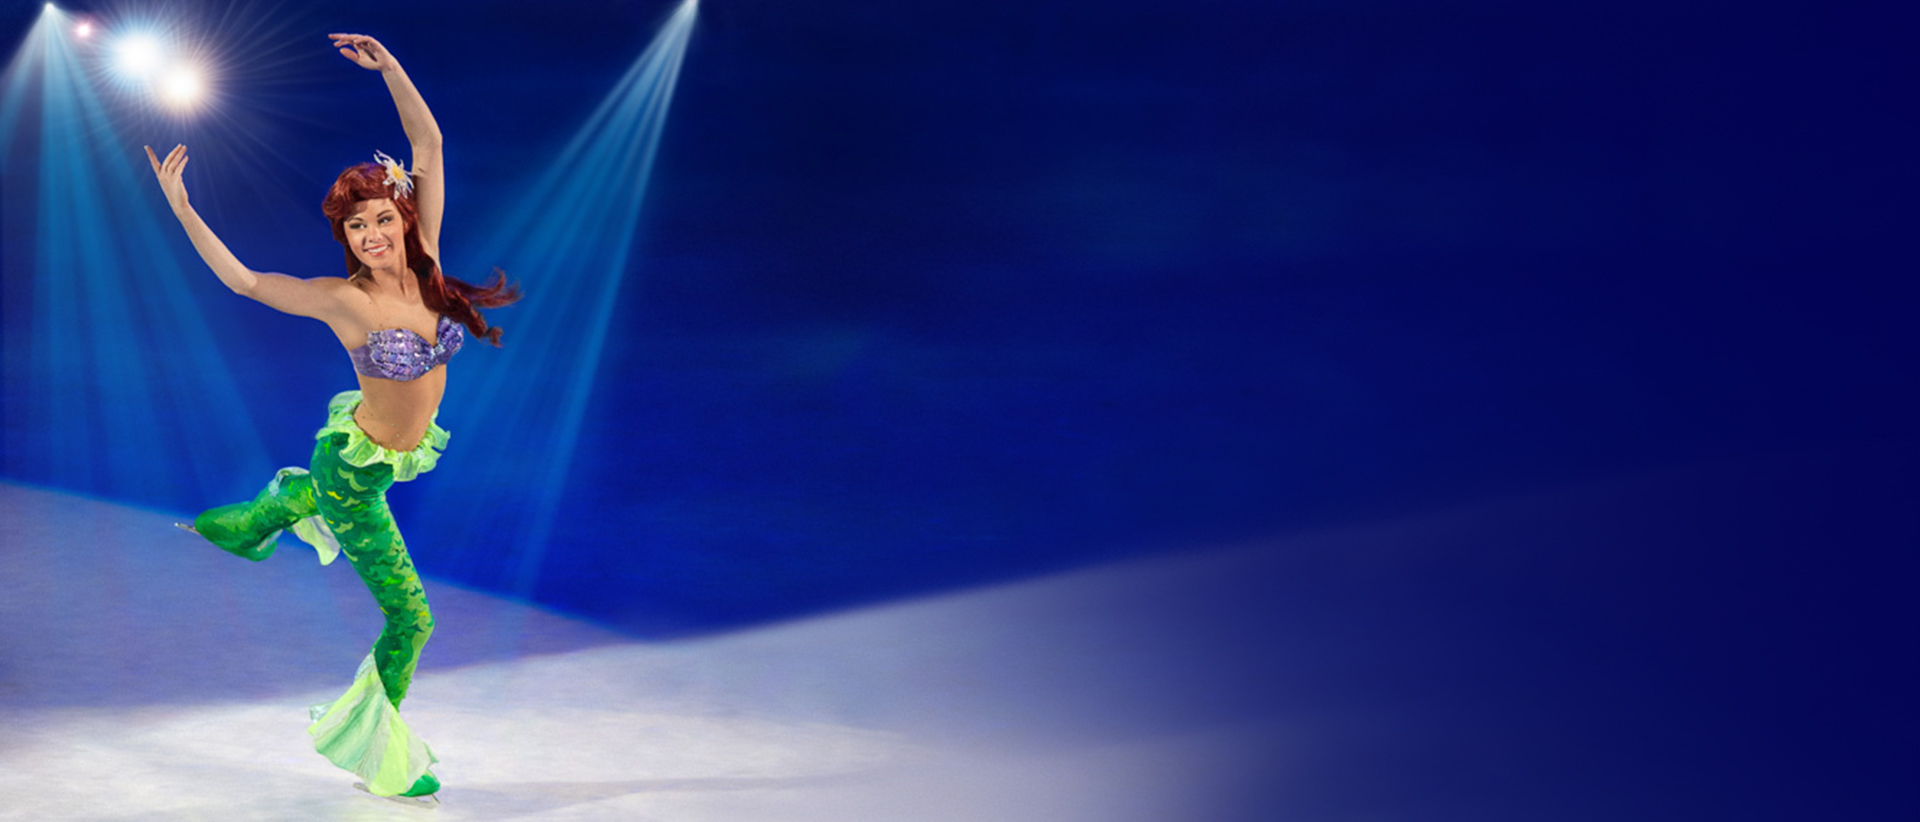 Ariel dancing on ice